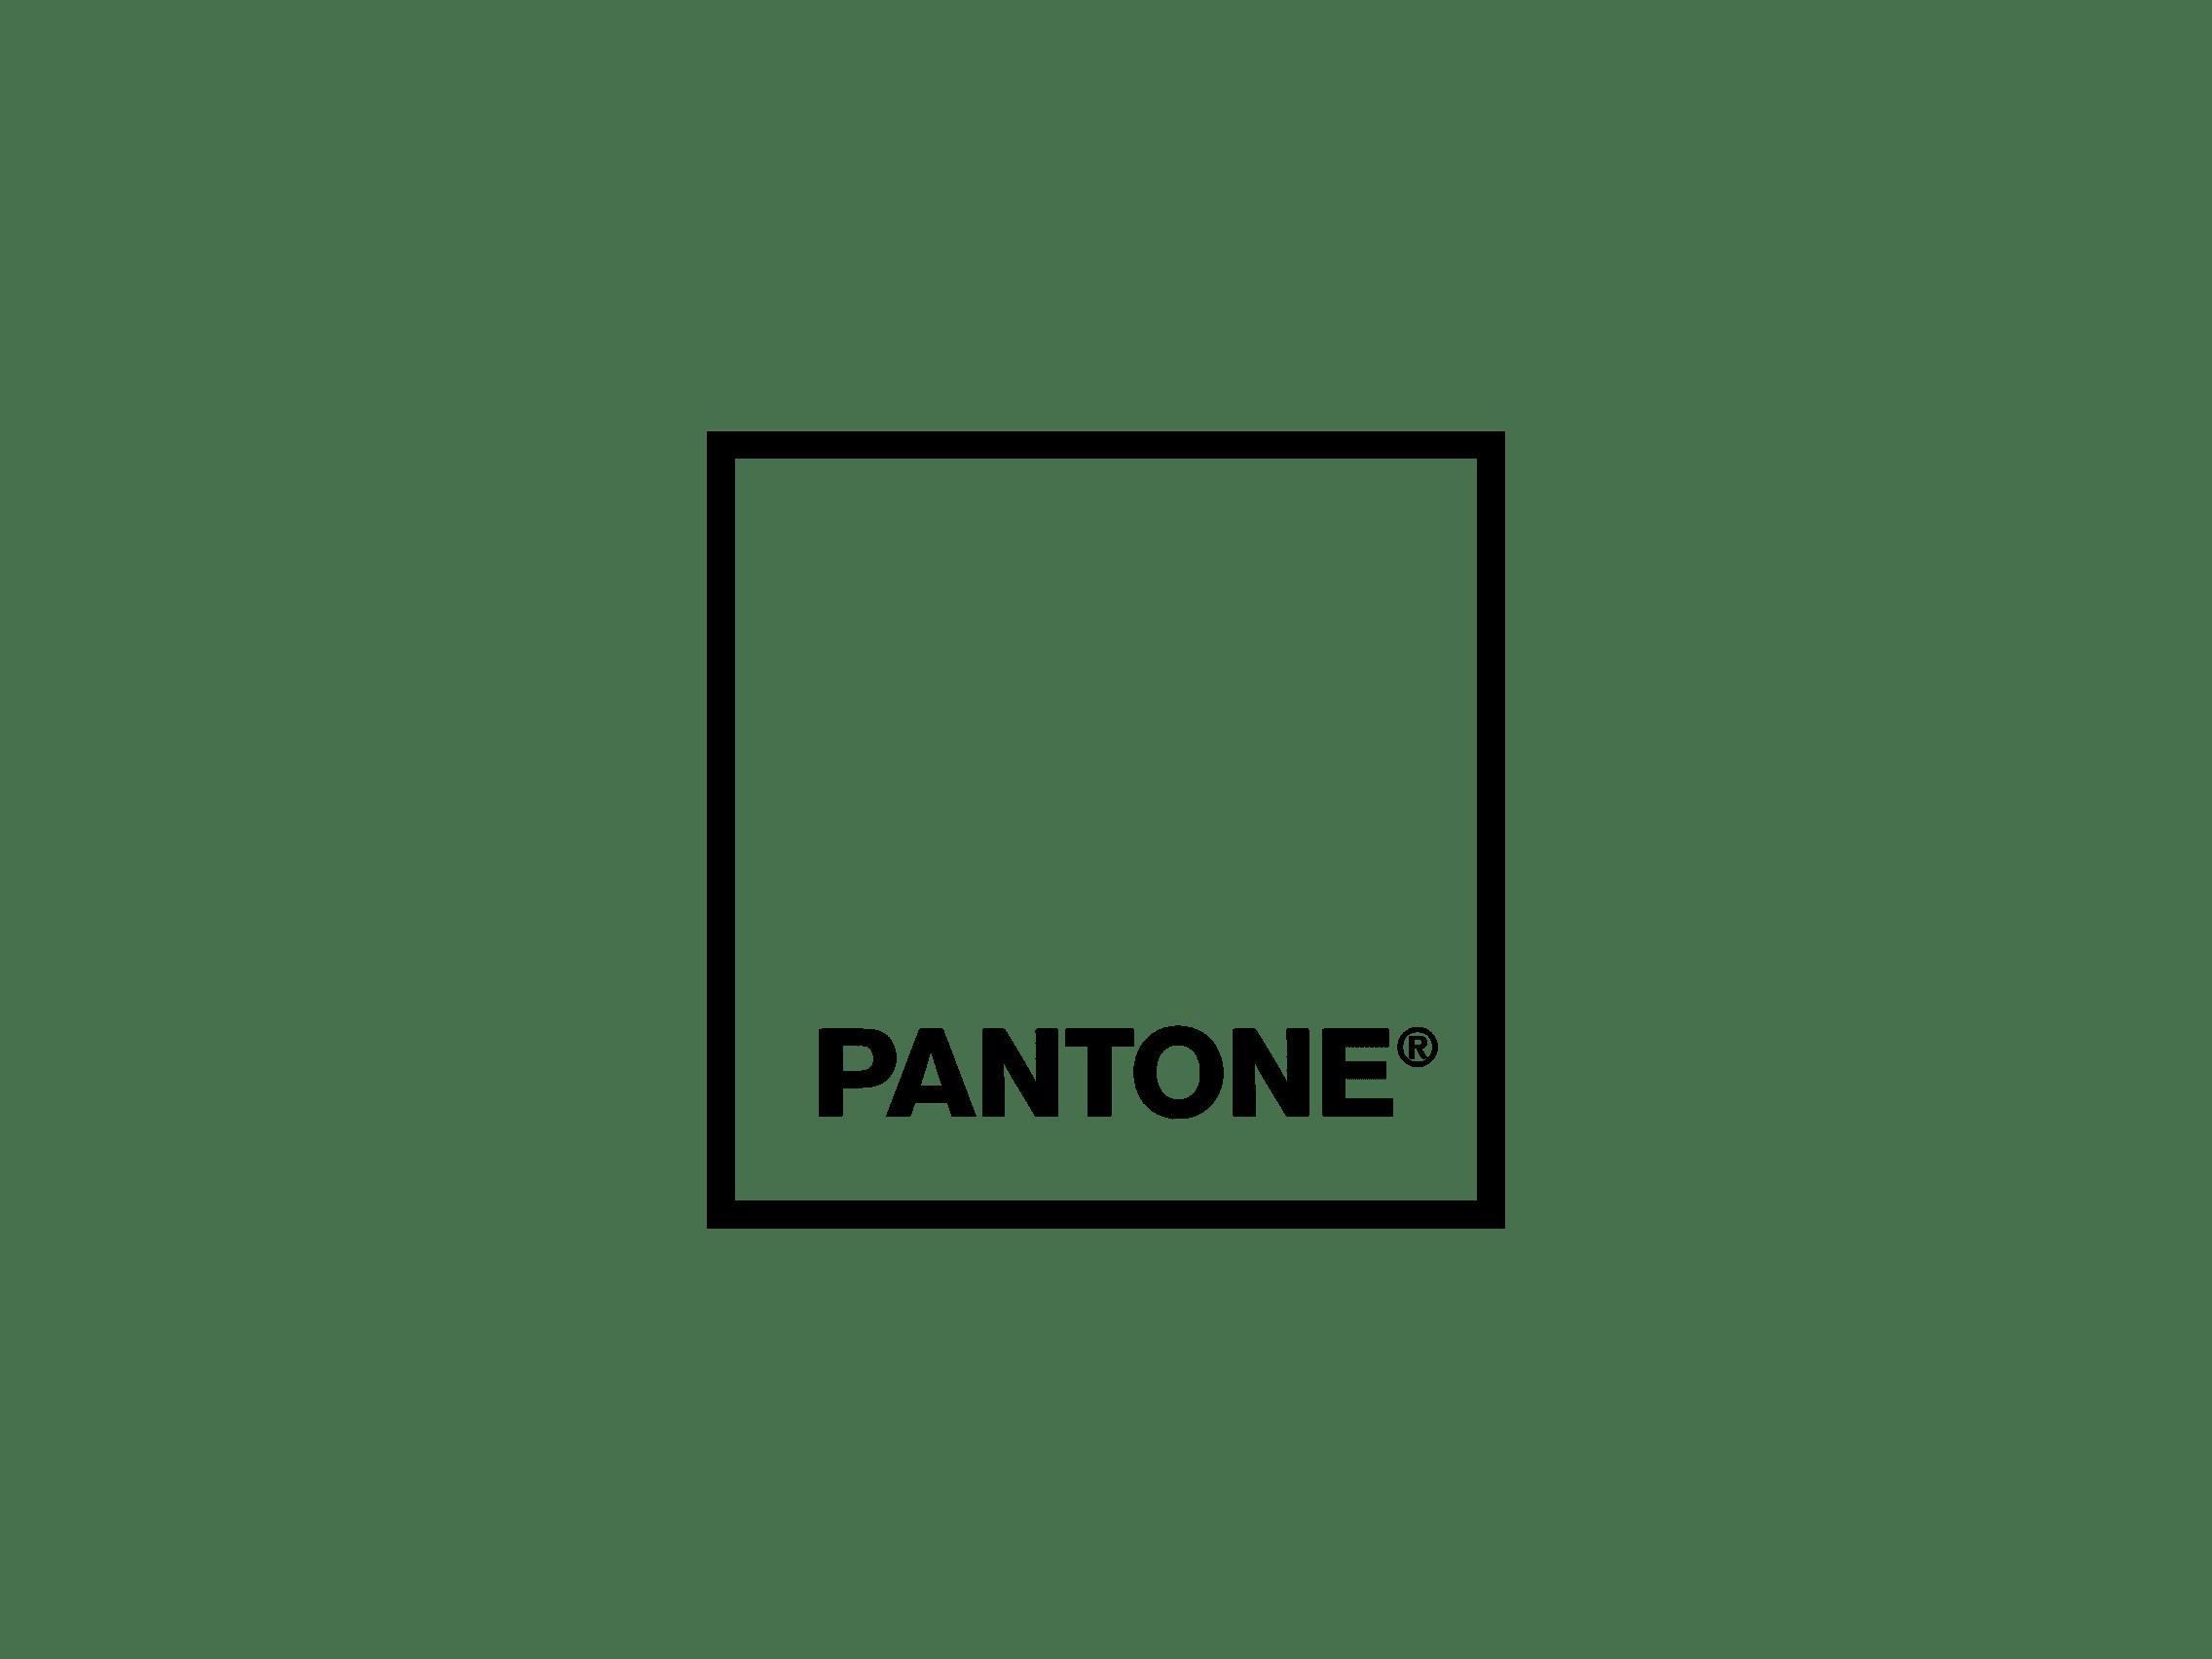 pantone-cor-do-ano-joiasgold